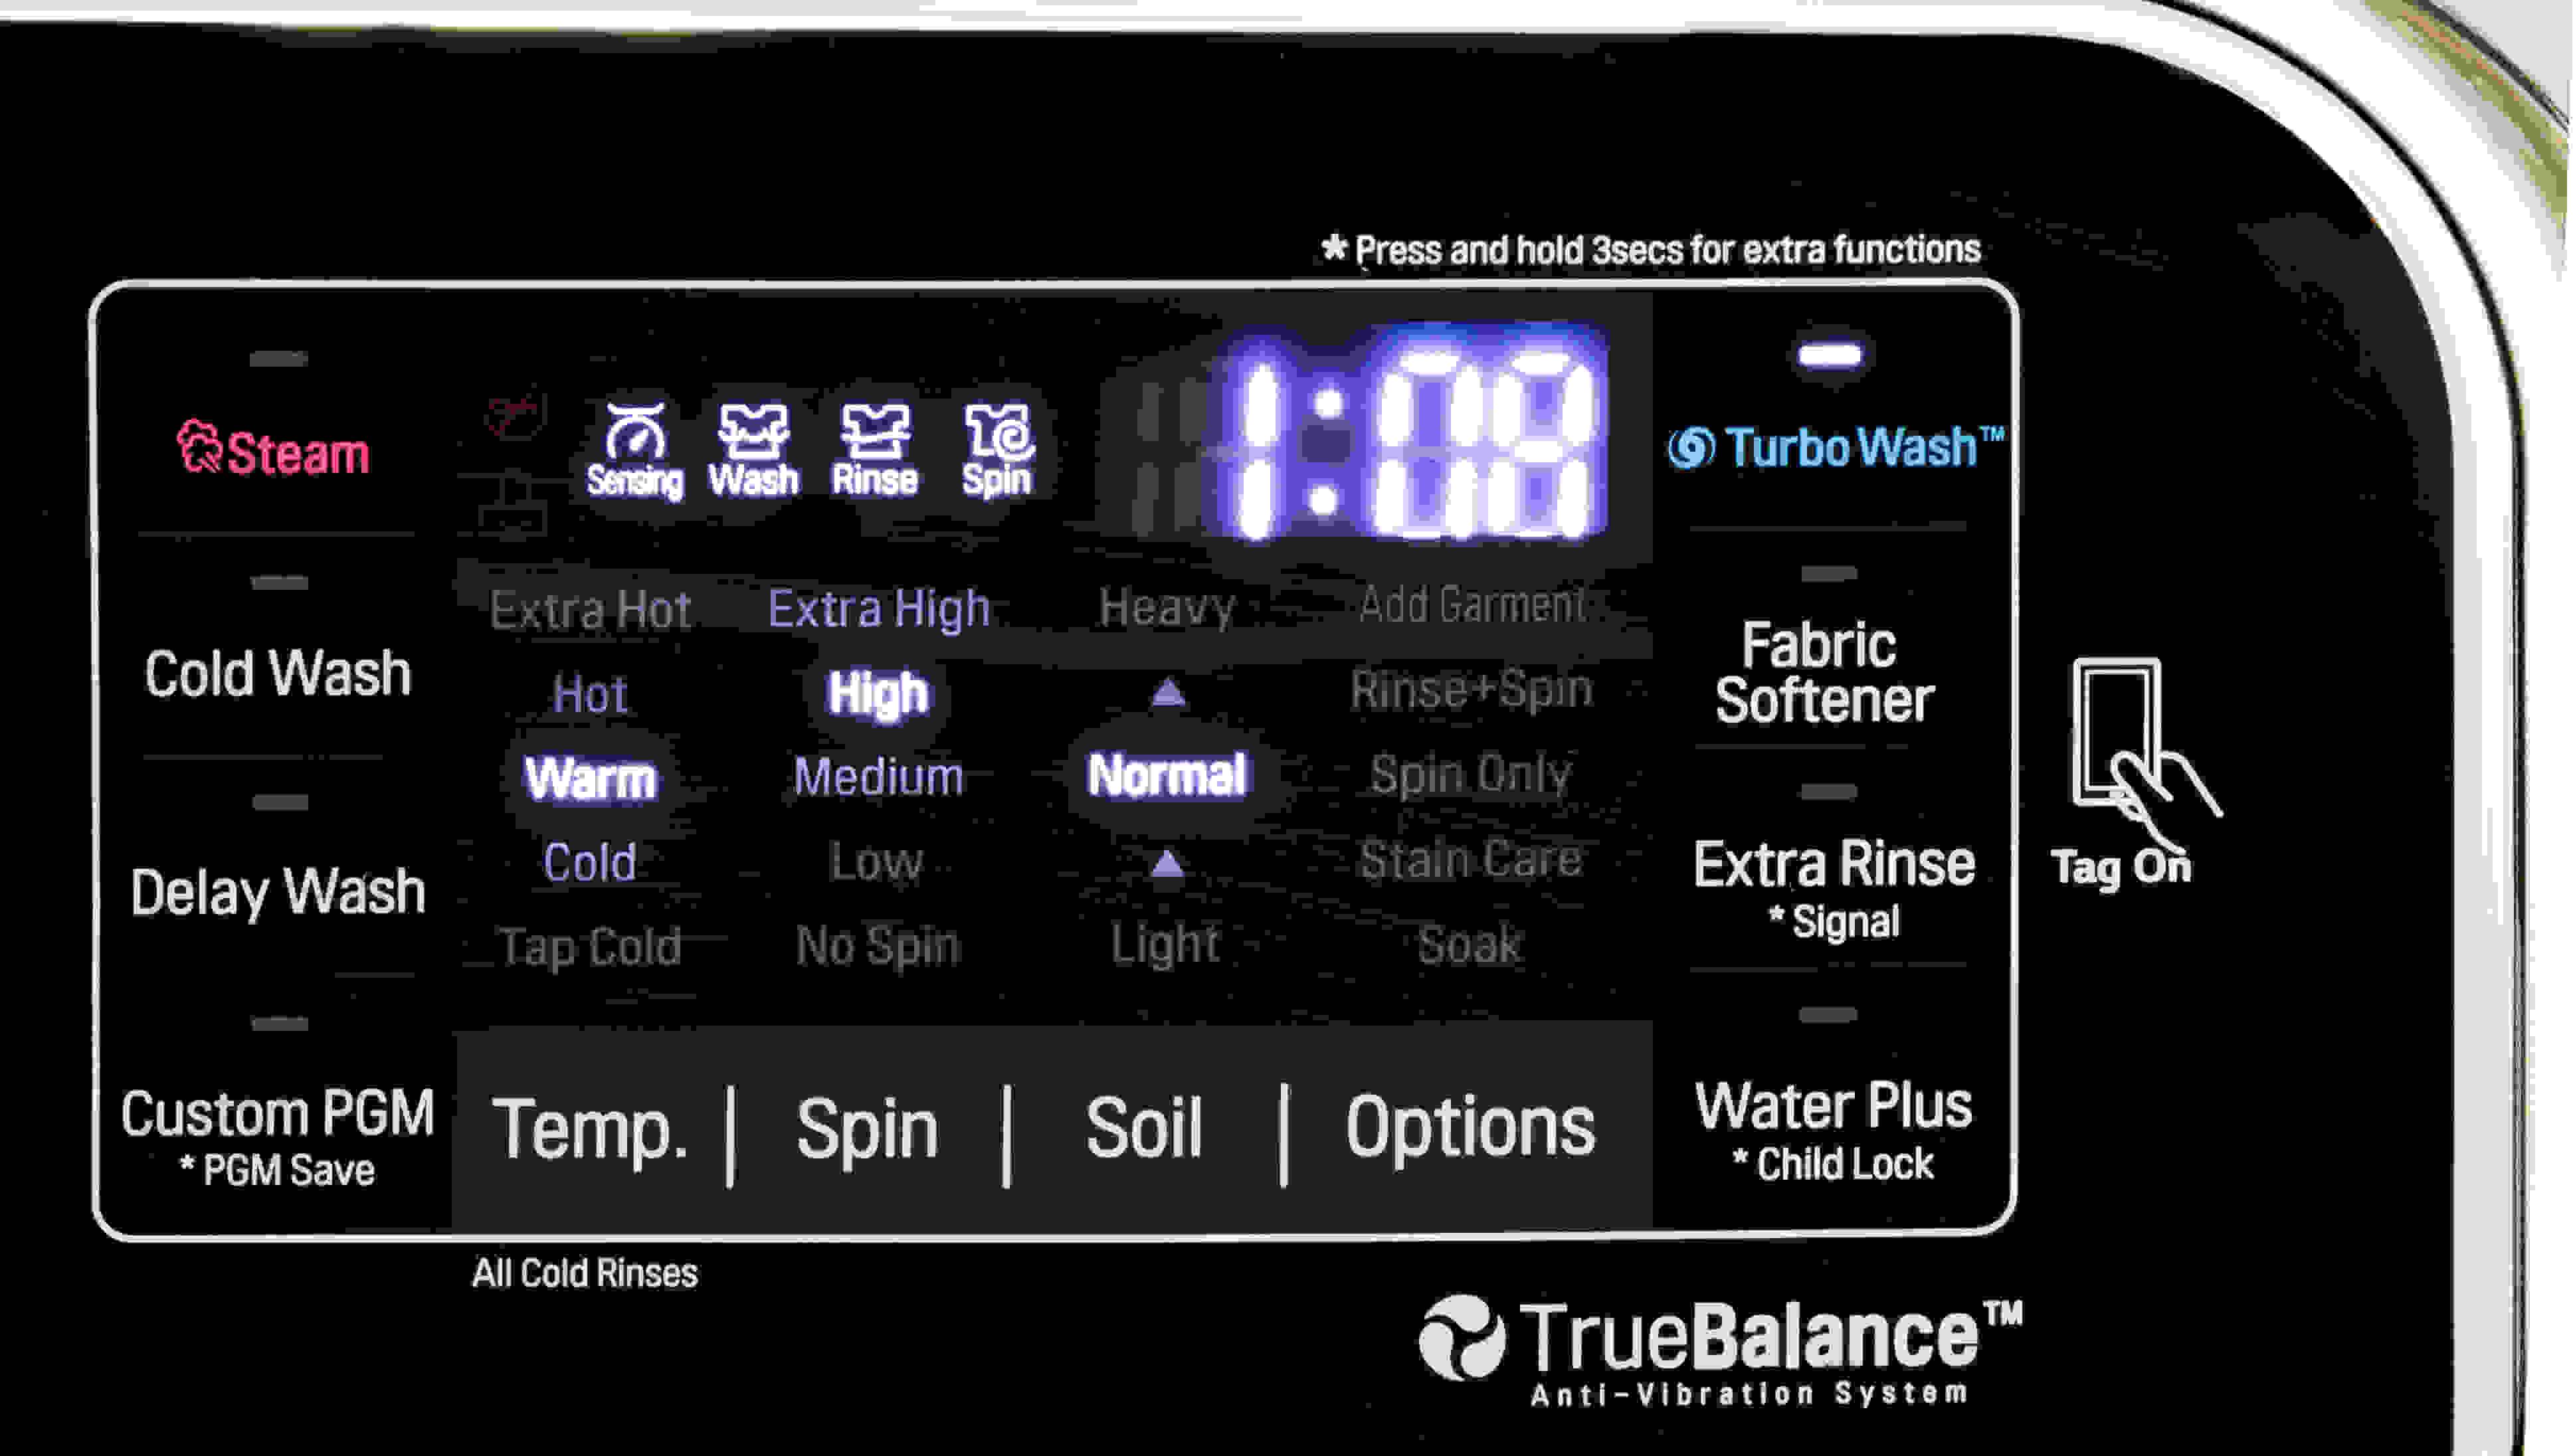 The LG WT7700HVA has plenty of extra features, including TurboWash.